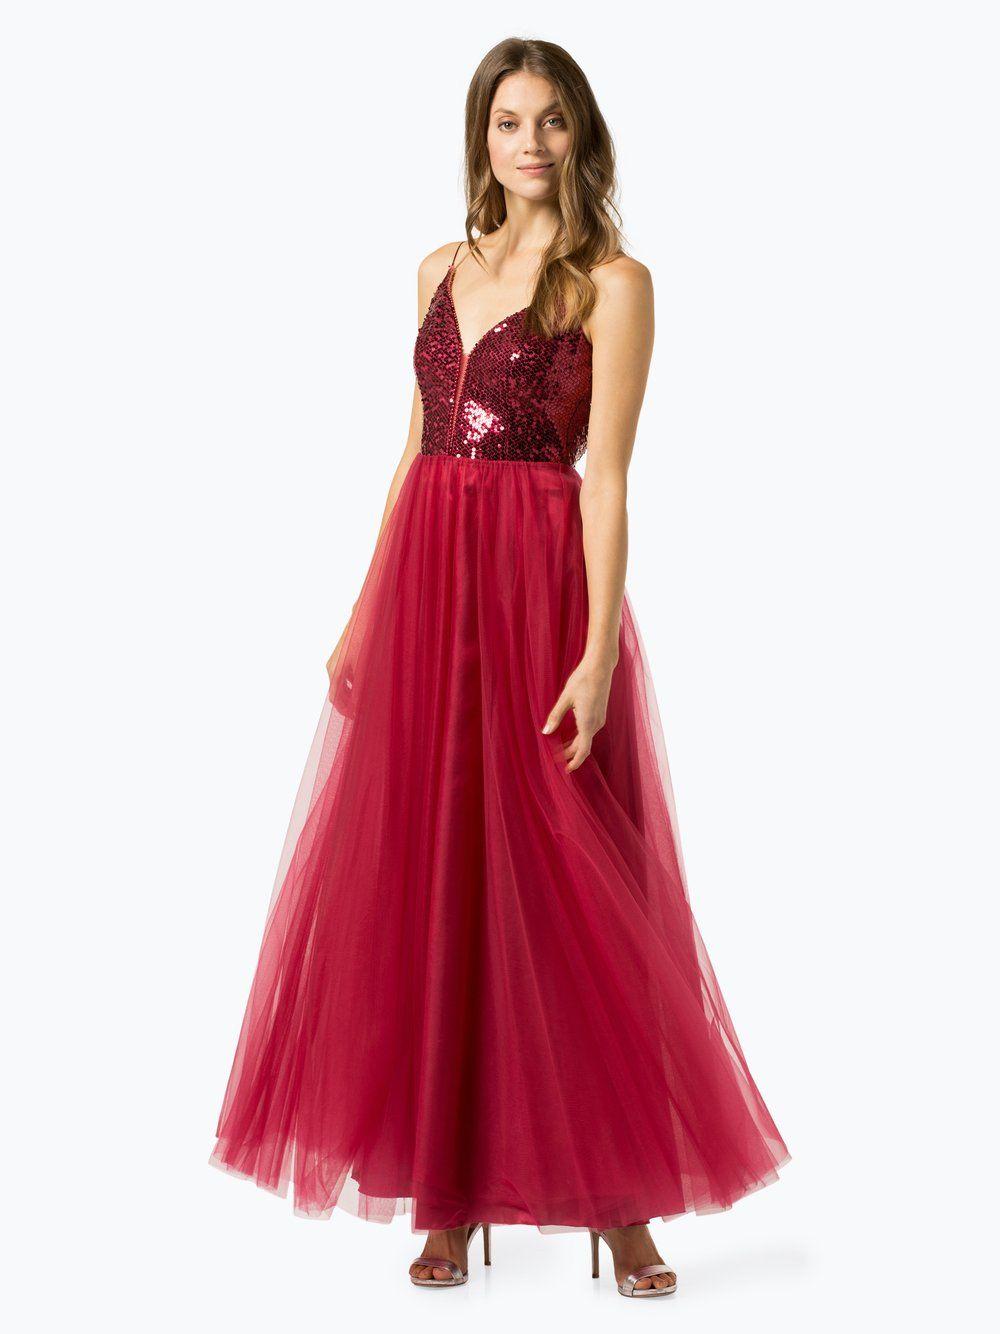 vm abendkleid rosa | abendkleid, abendkleid rosa, kleider